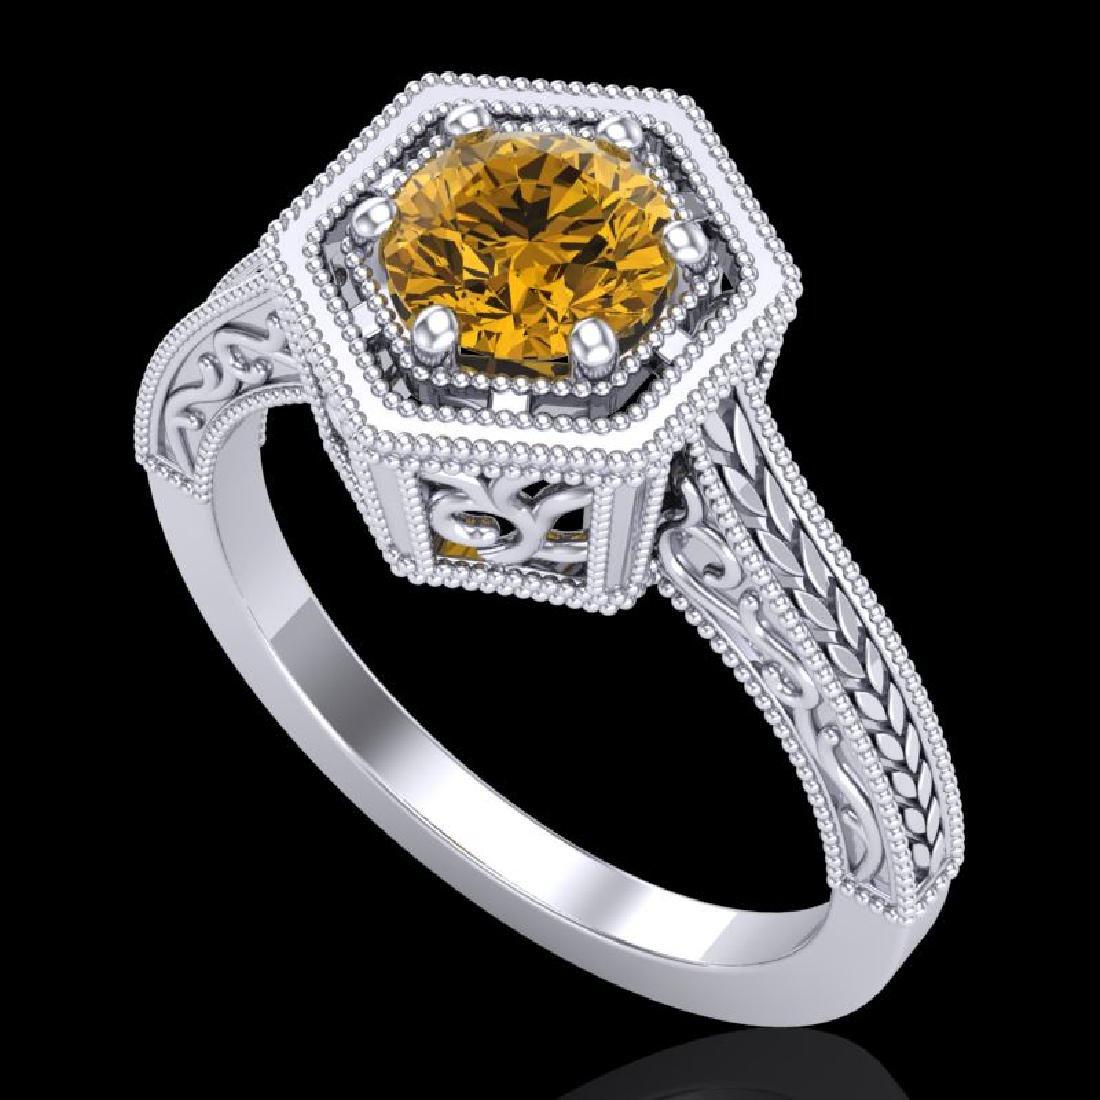 0.77 CTW Intense Fancy Yellow Diamond Engagement Art